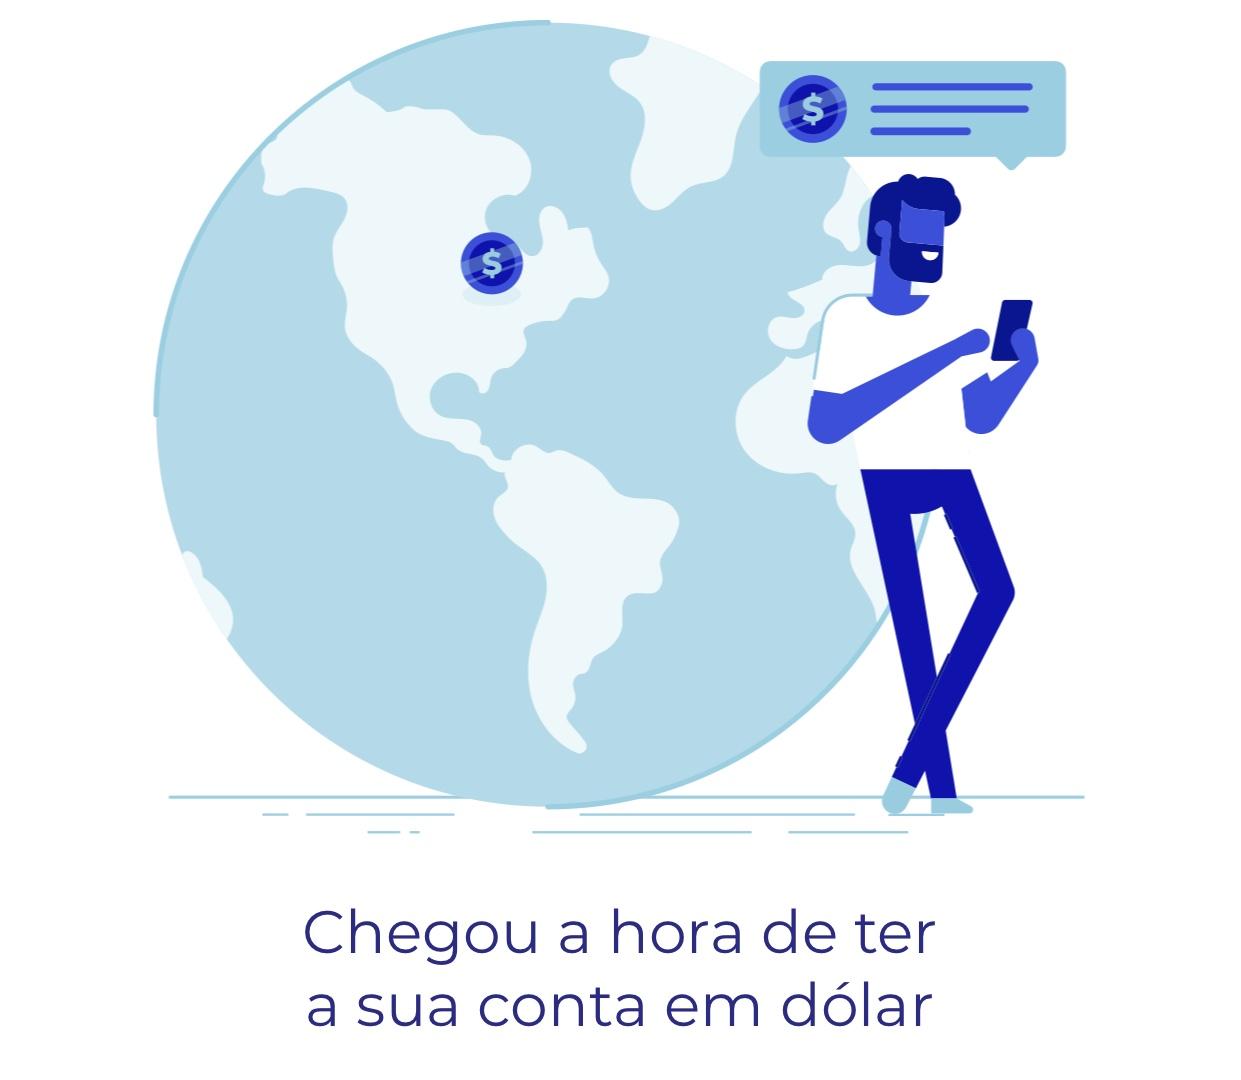 containternacional Como funciona a conta internacional em dólar do banco BS2